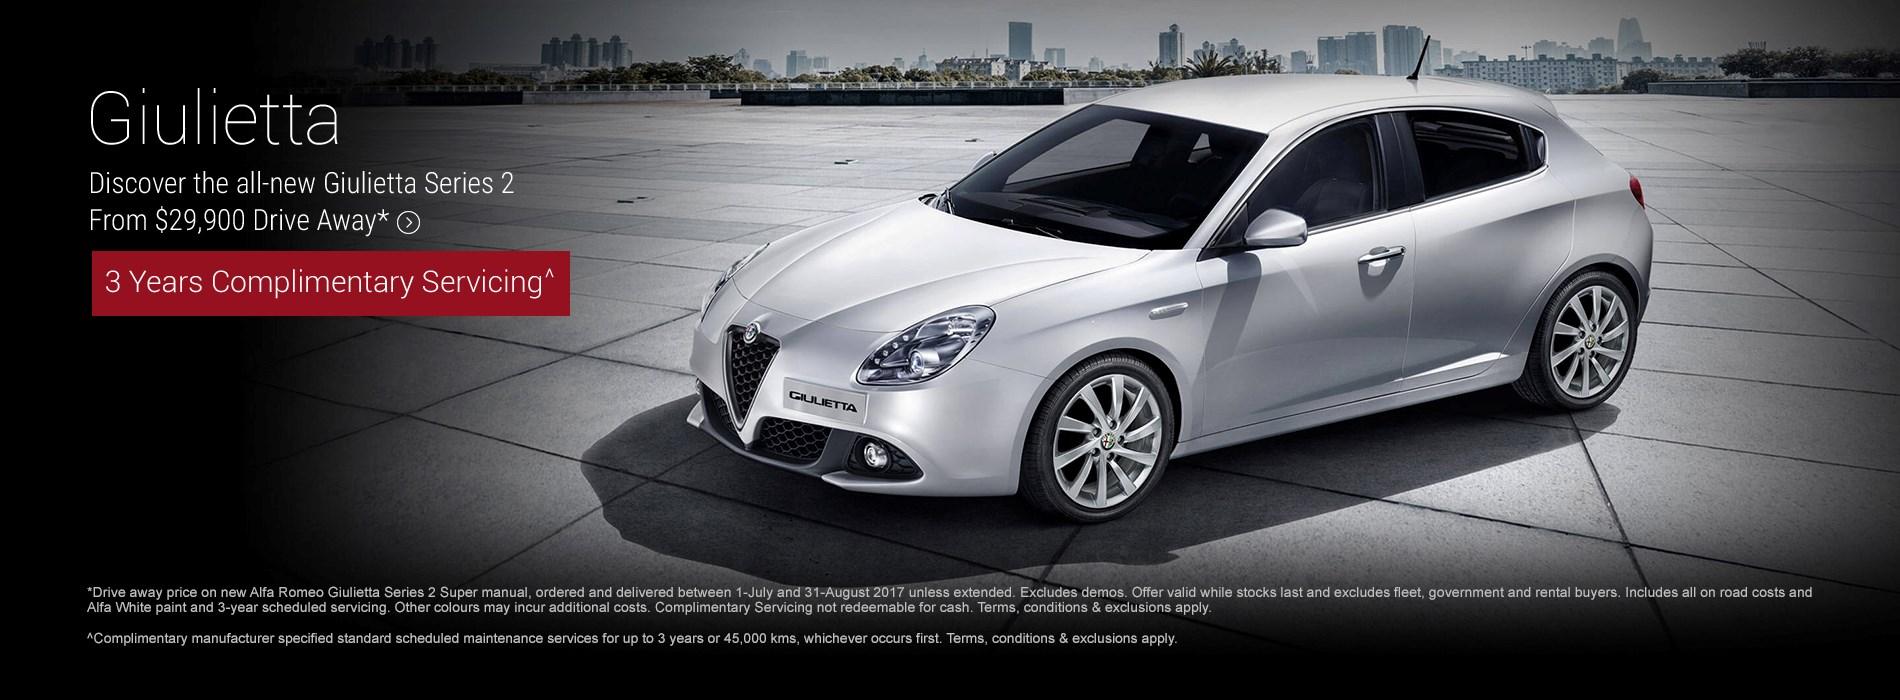 Alfa Romeo Giulietta Series 2 Super Manual $29.9K Drive Away